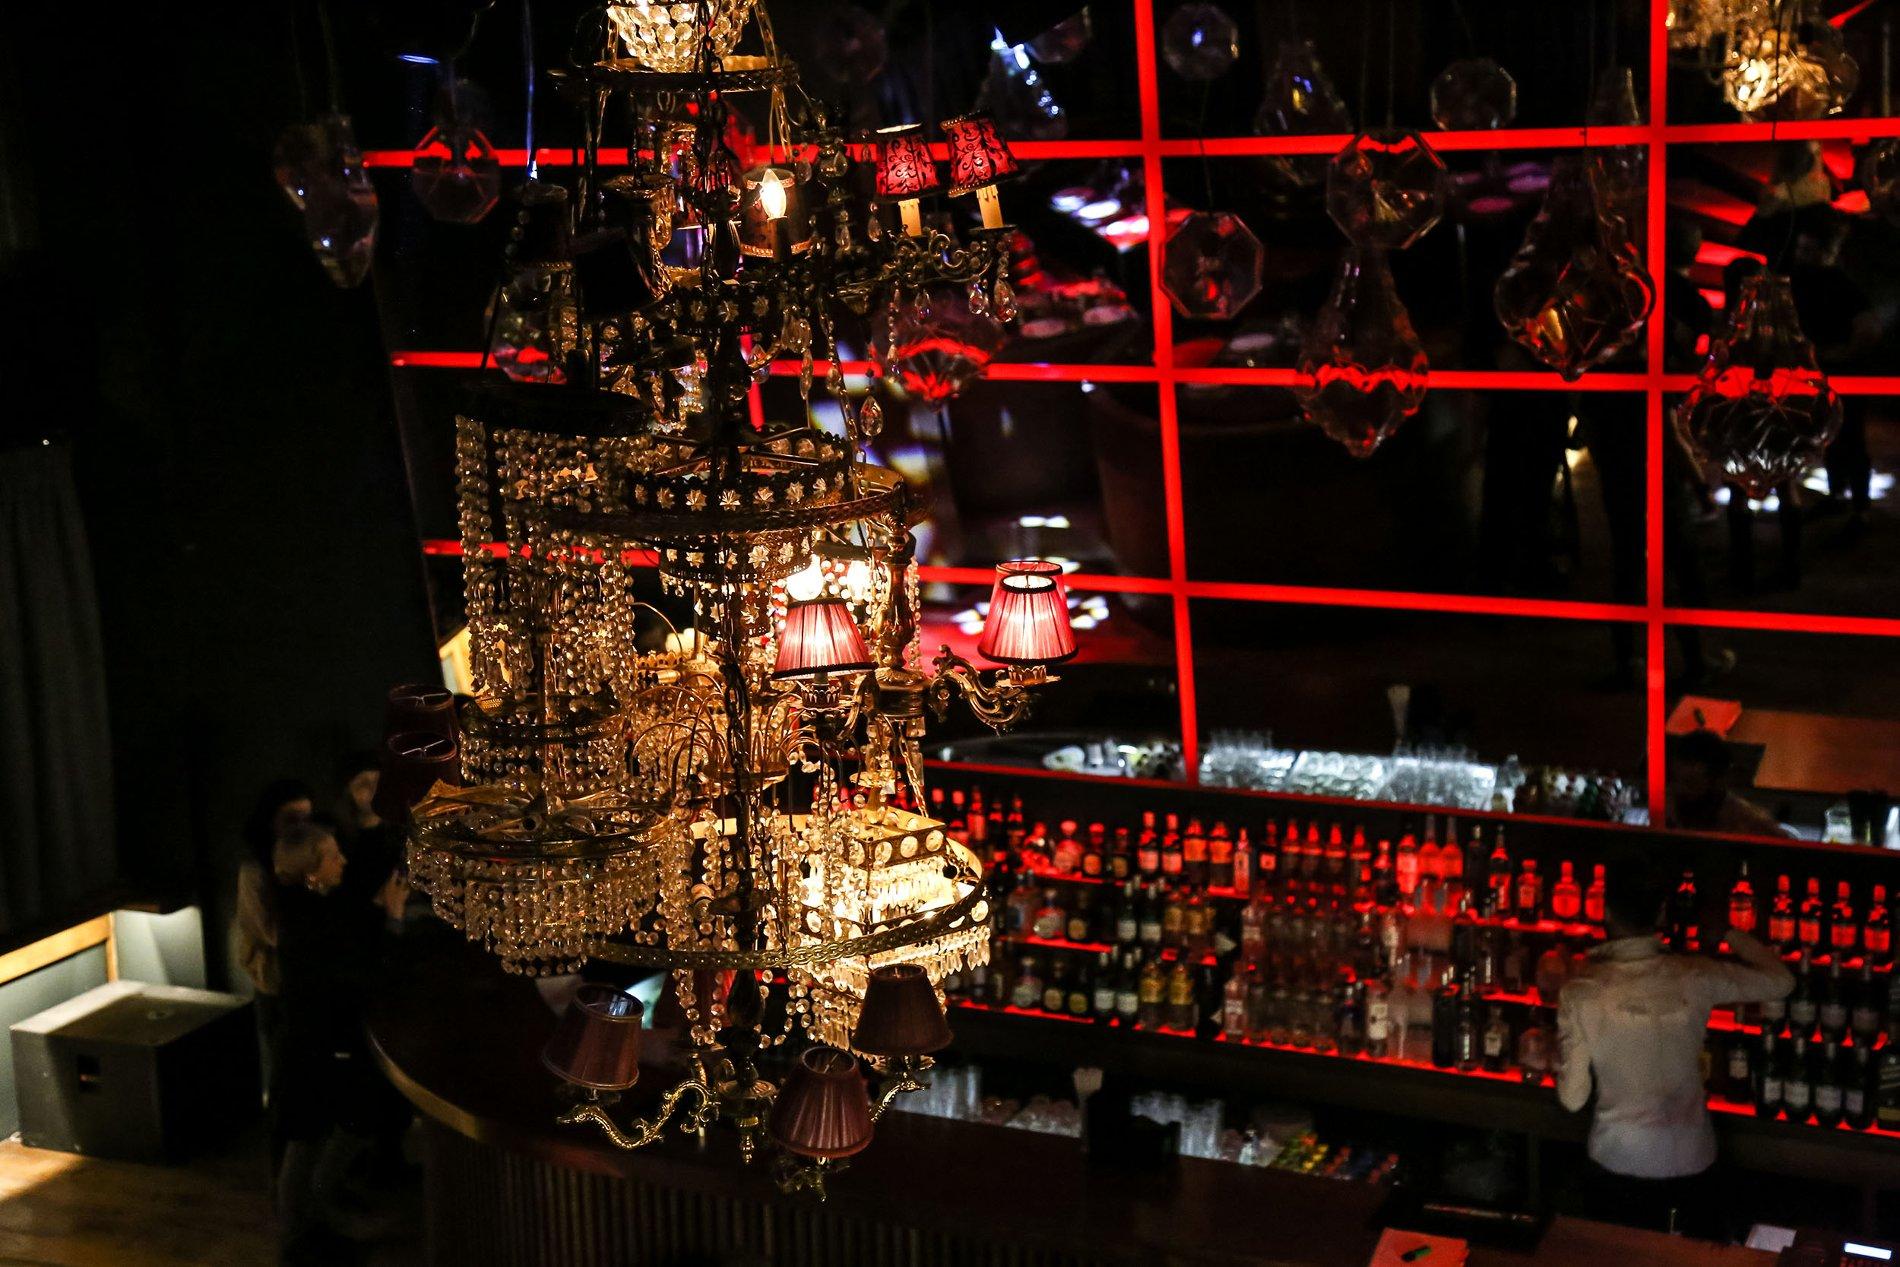 The new renovated version of the legendary Rock 'n' Roll bar in Kolonaki. Source:  Lifo